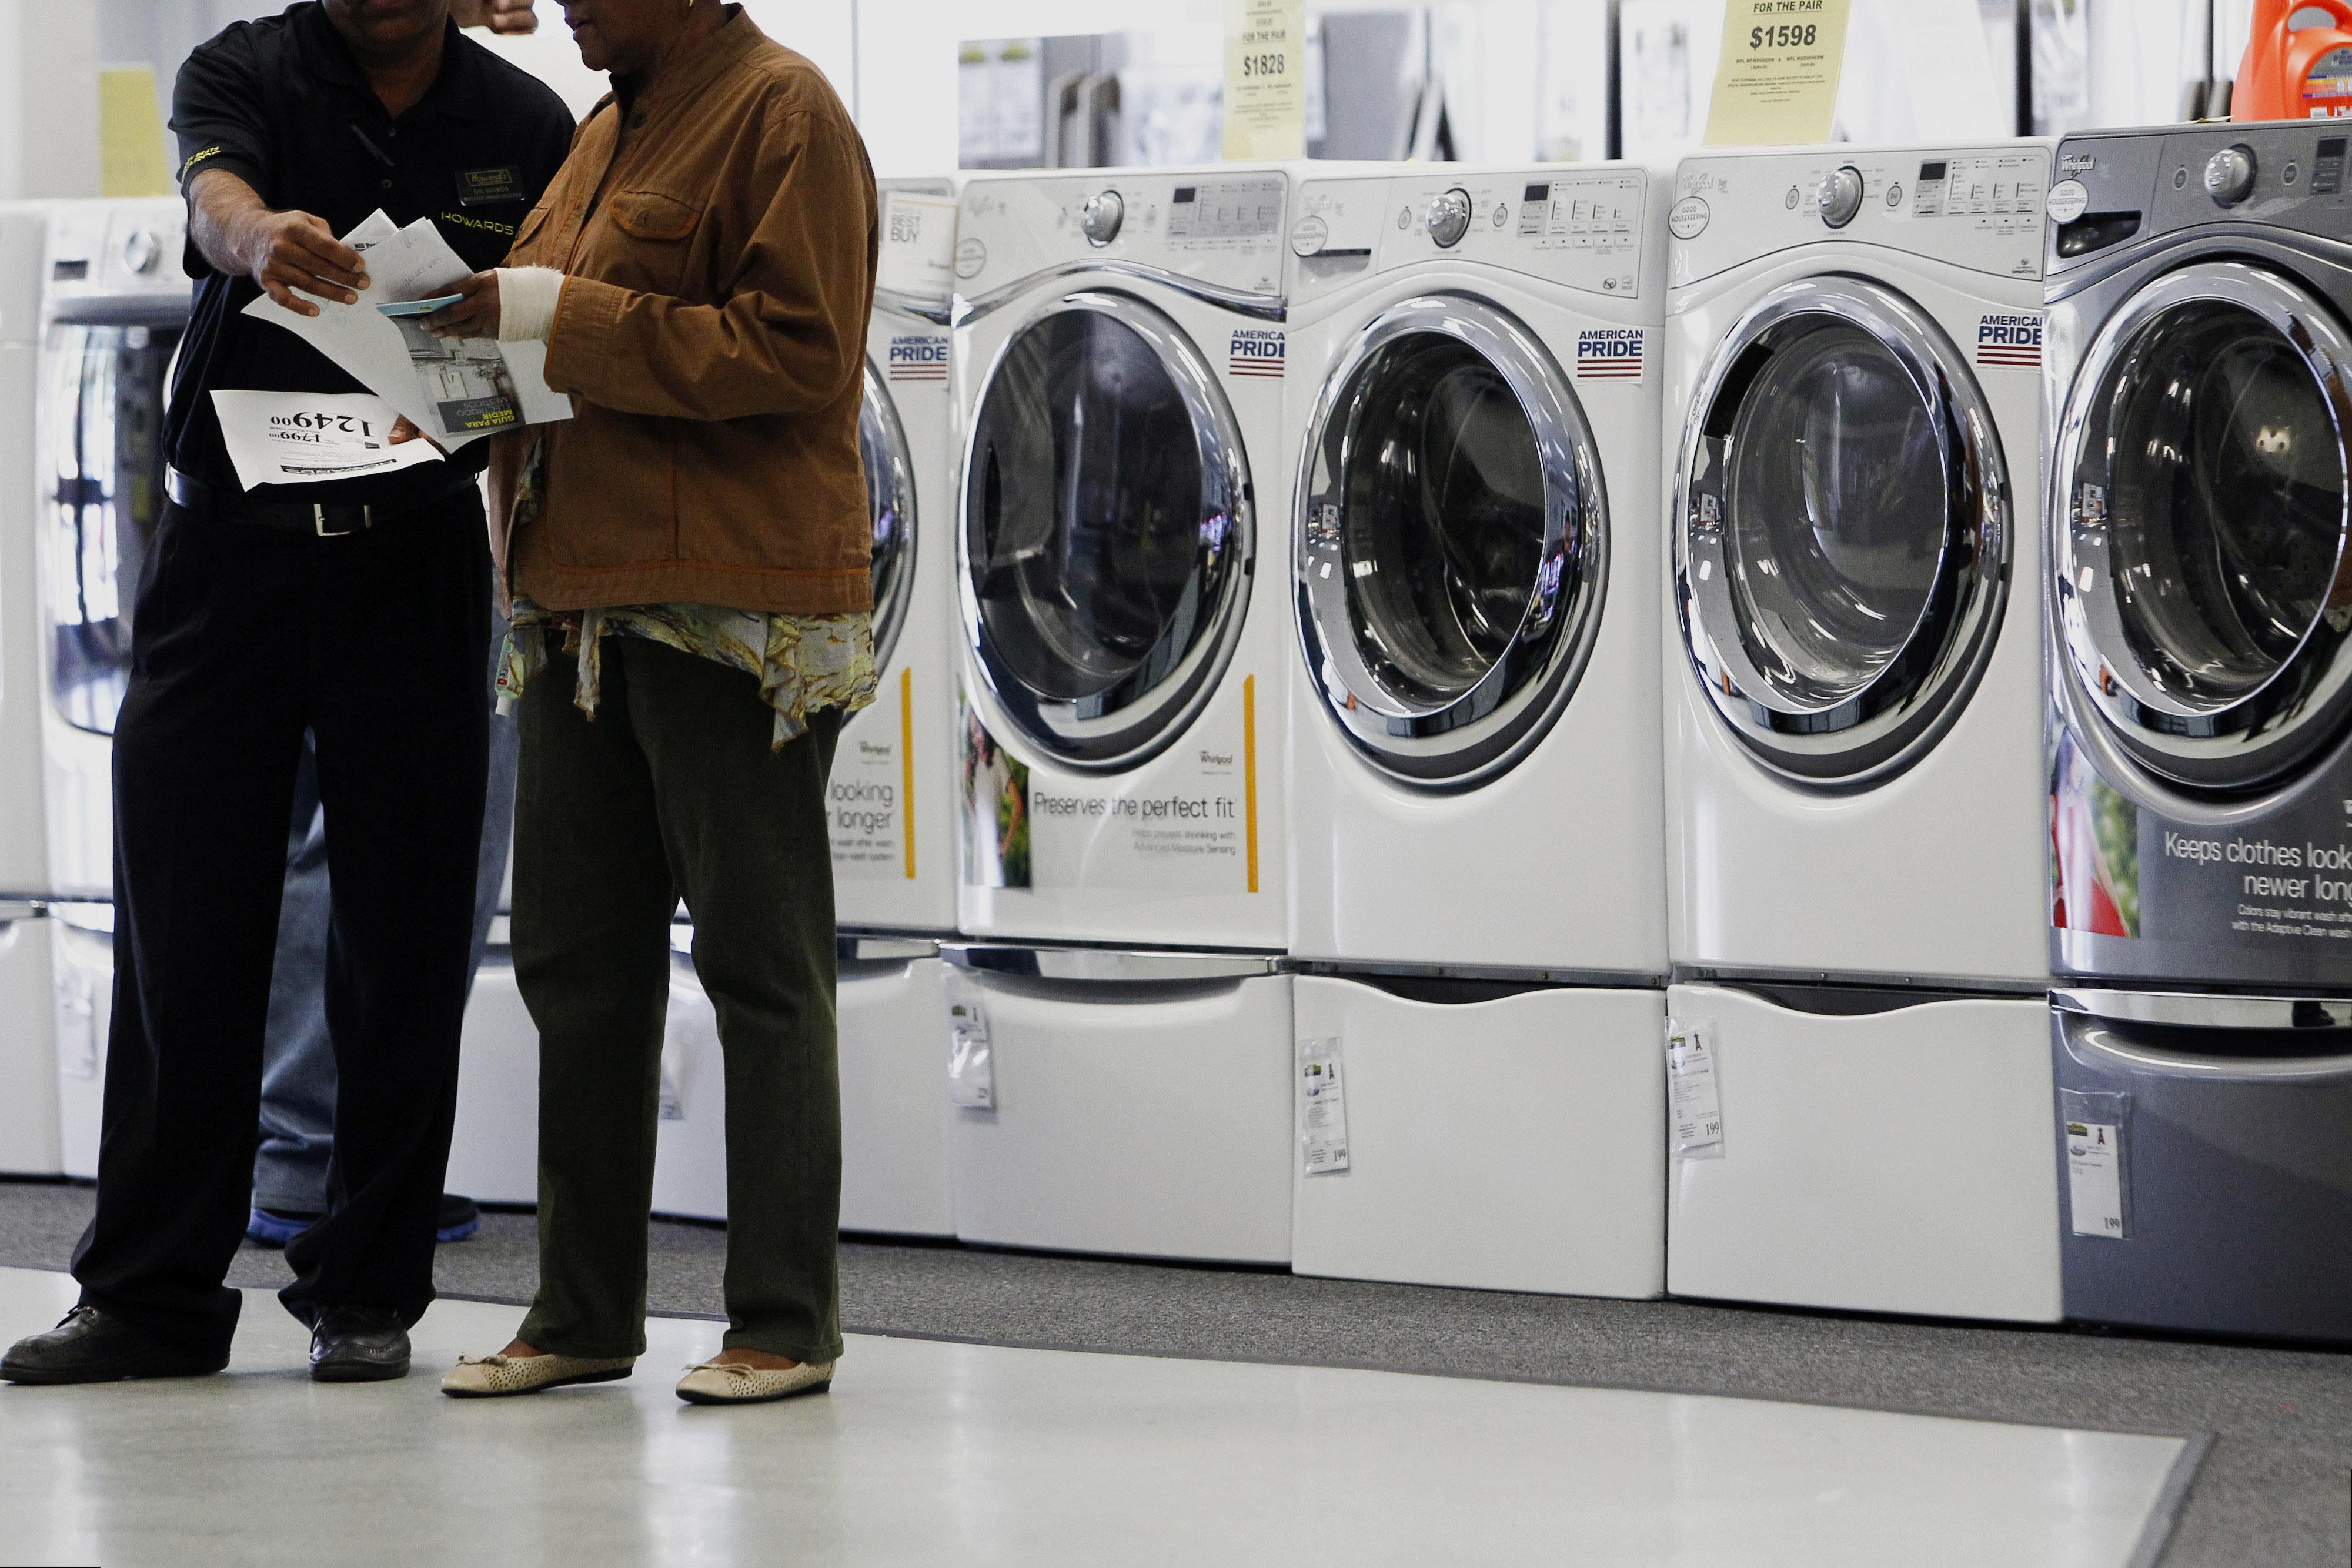 Inside A Whirlpool Retailer Ahead Of Earnings Figures